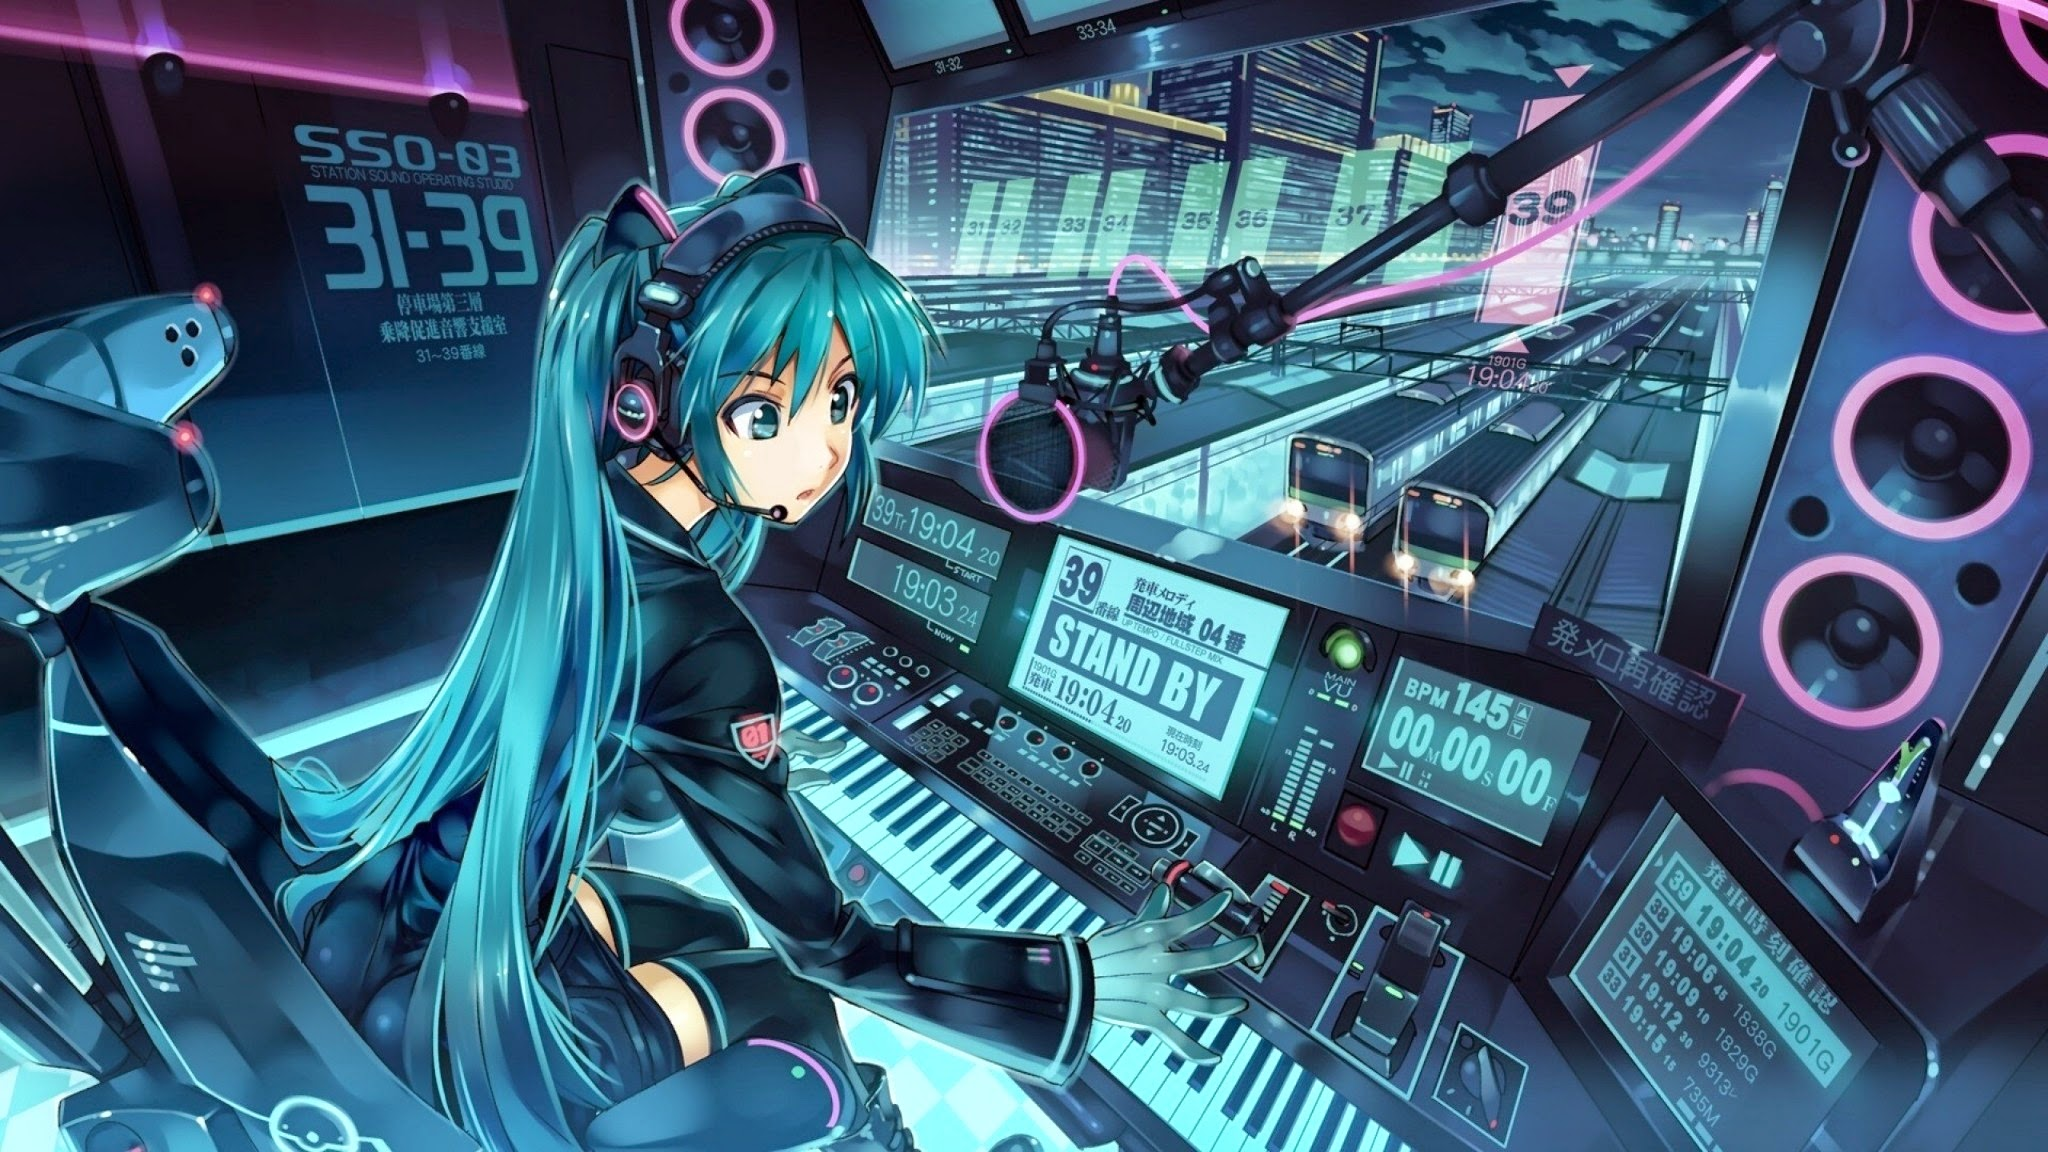 Anime Techno Wallpaper Vocaloid hatsune miku anime dj 2048x1152